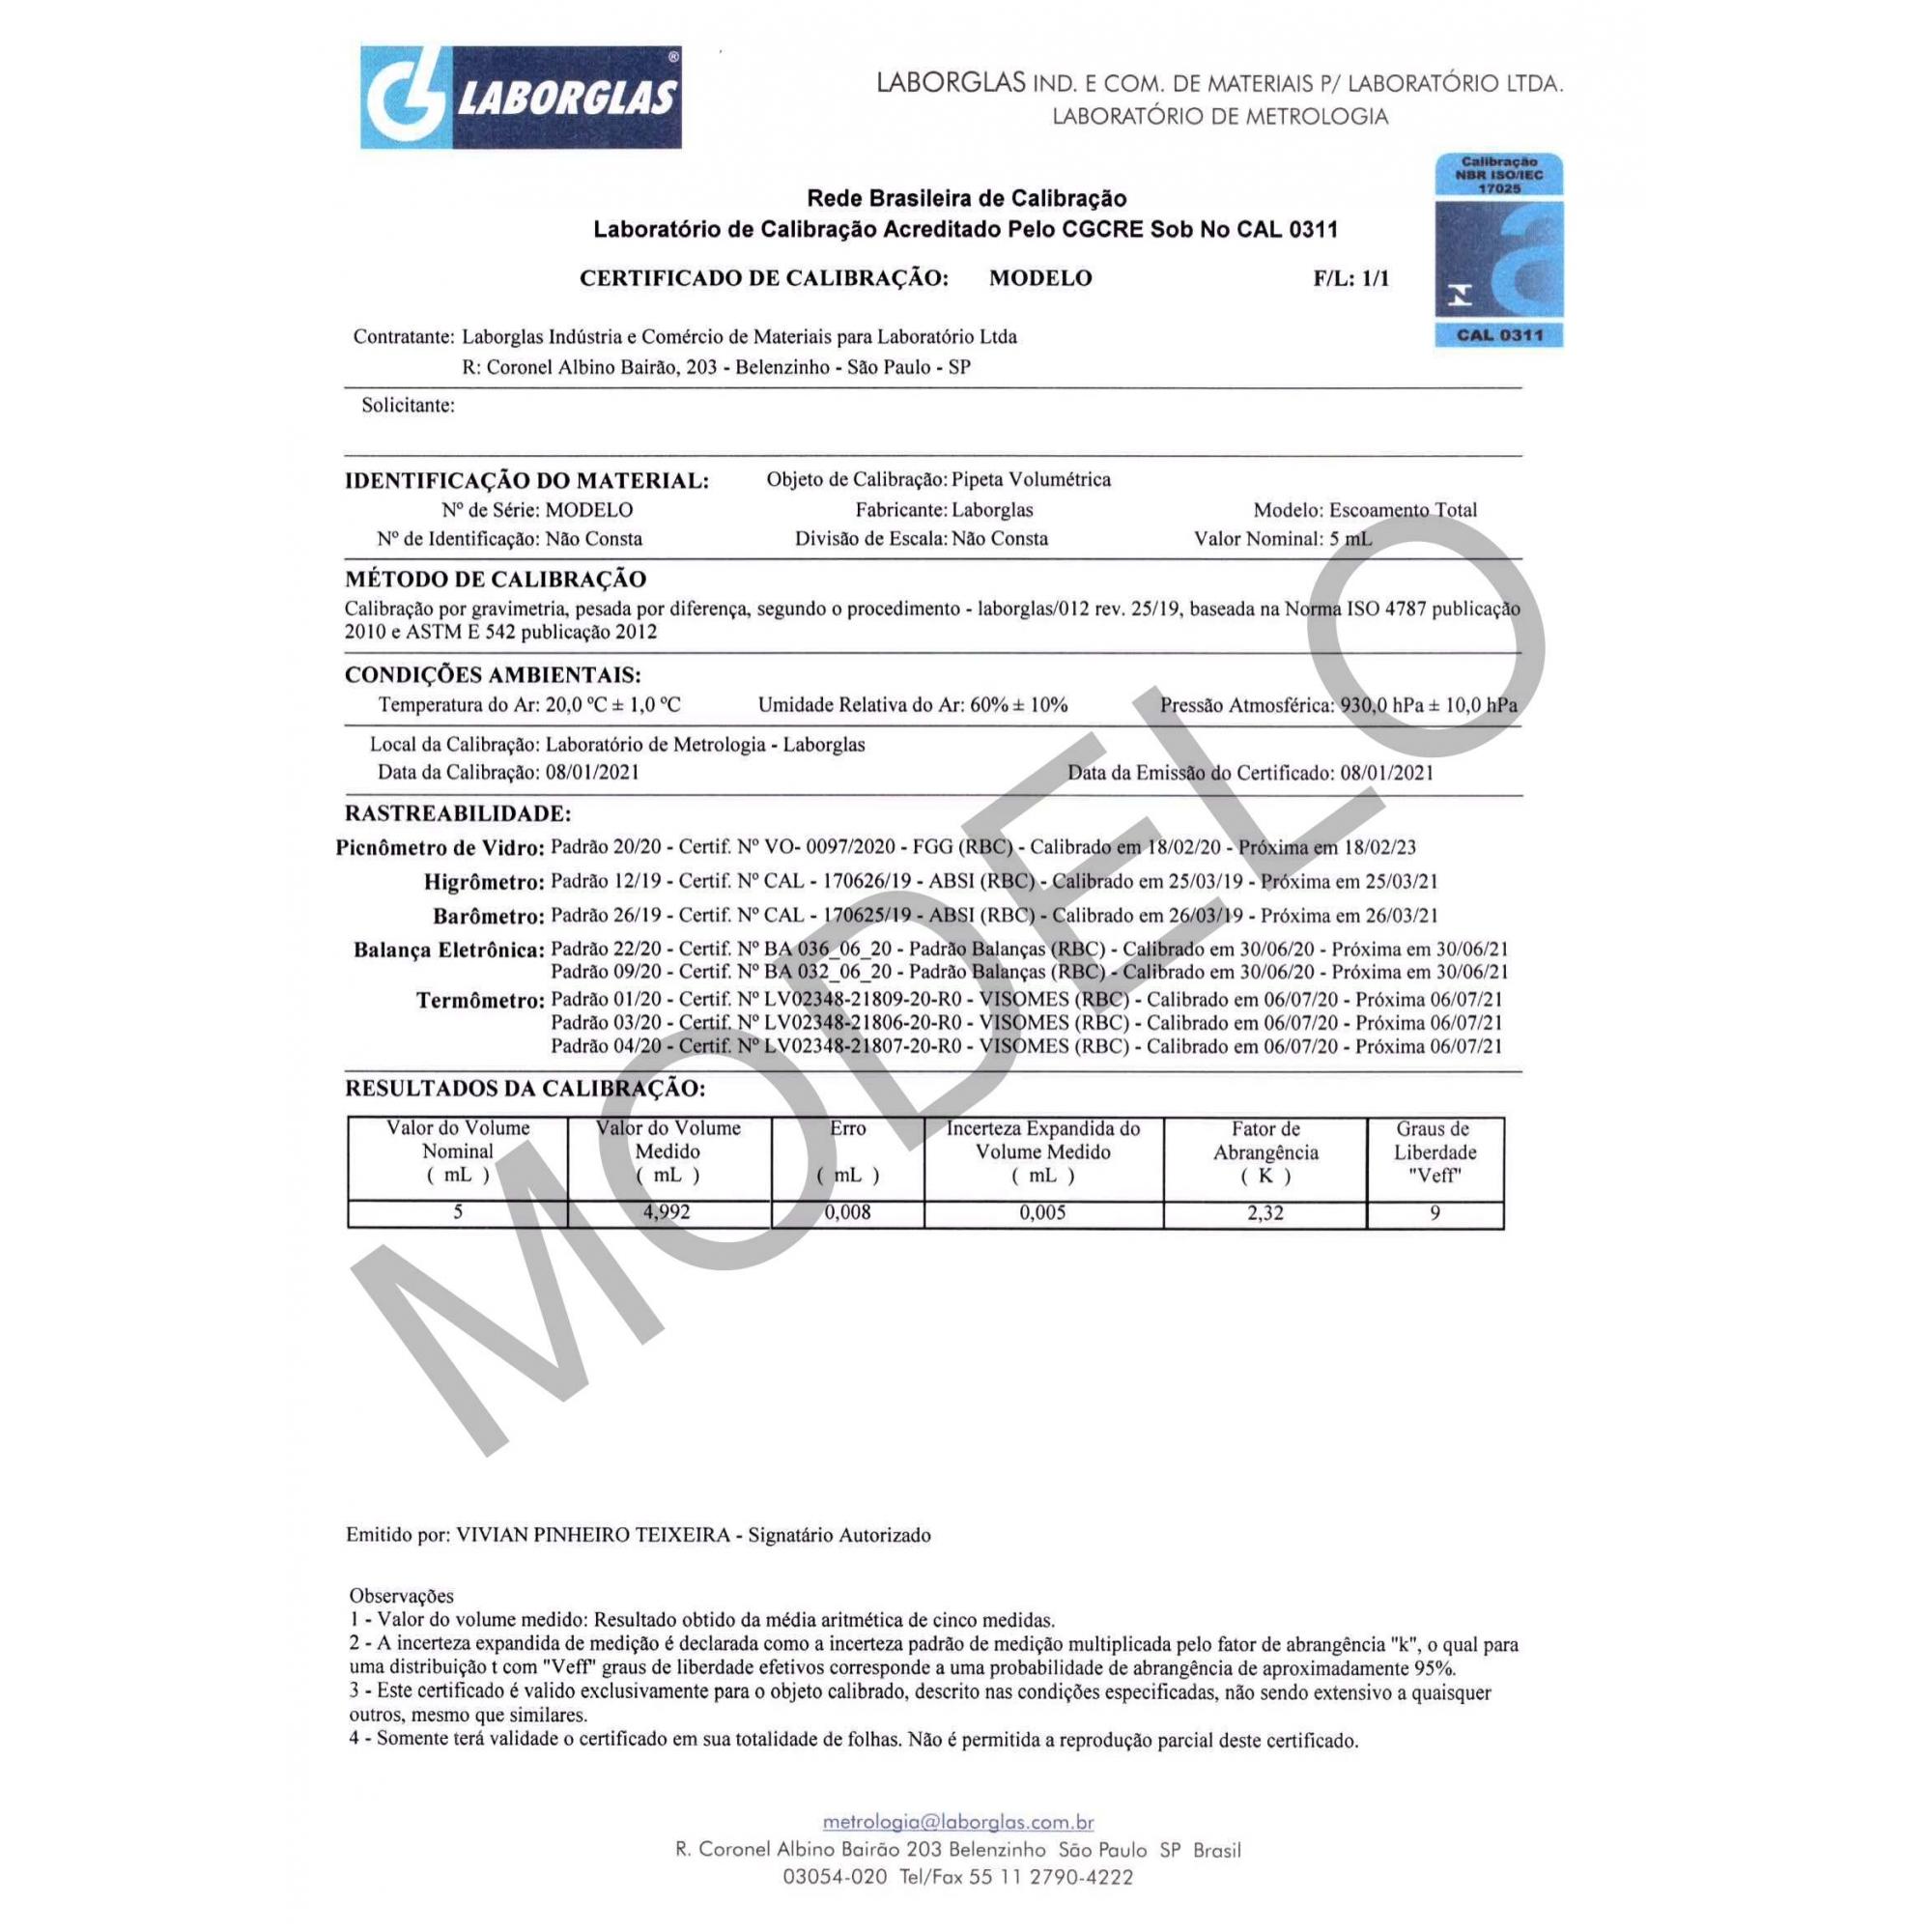 PIPETA VOLUMÉTRICA ESGOTAMENTO TOTAL 13 ML CERTIFICADO RBC - Laborglas - Cód. 9433727-R